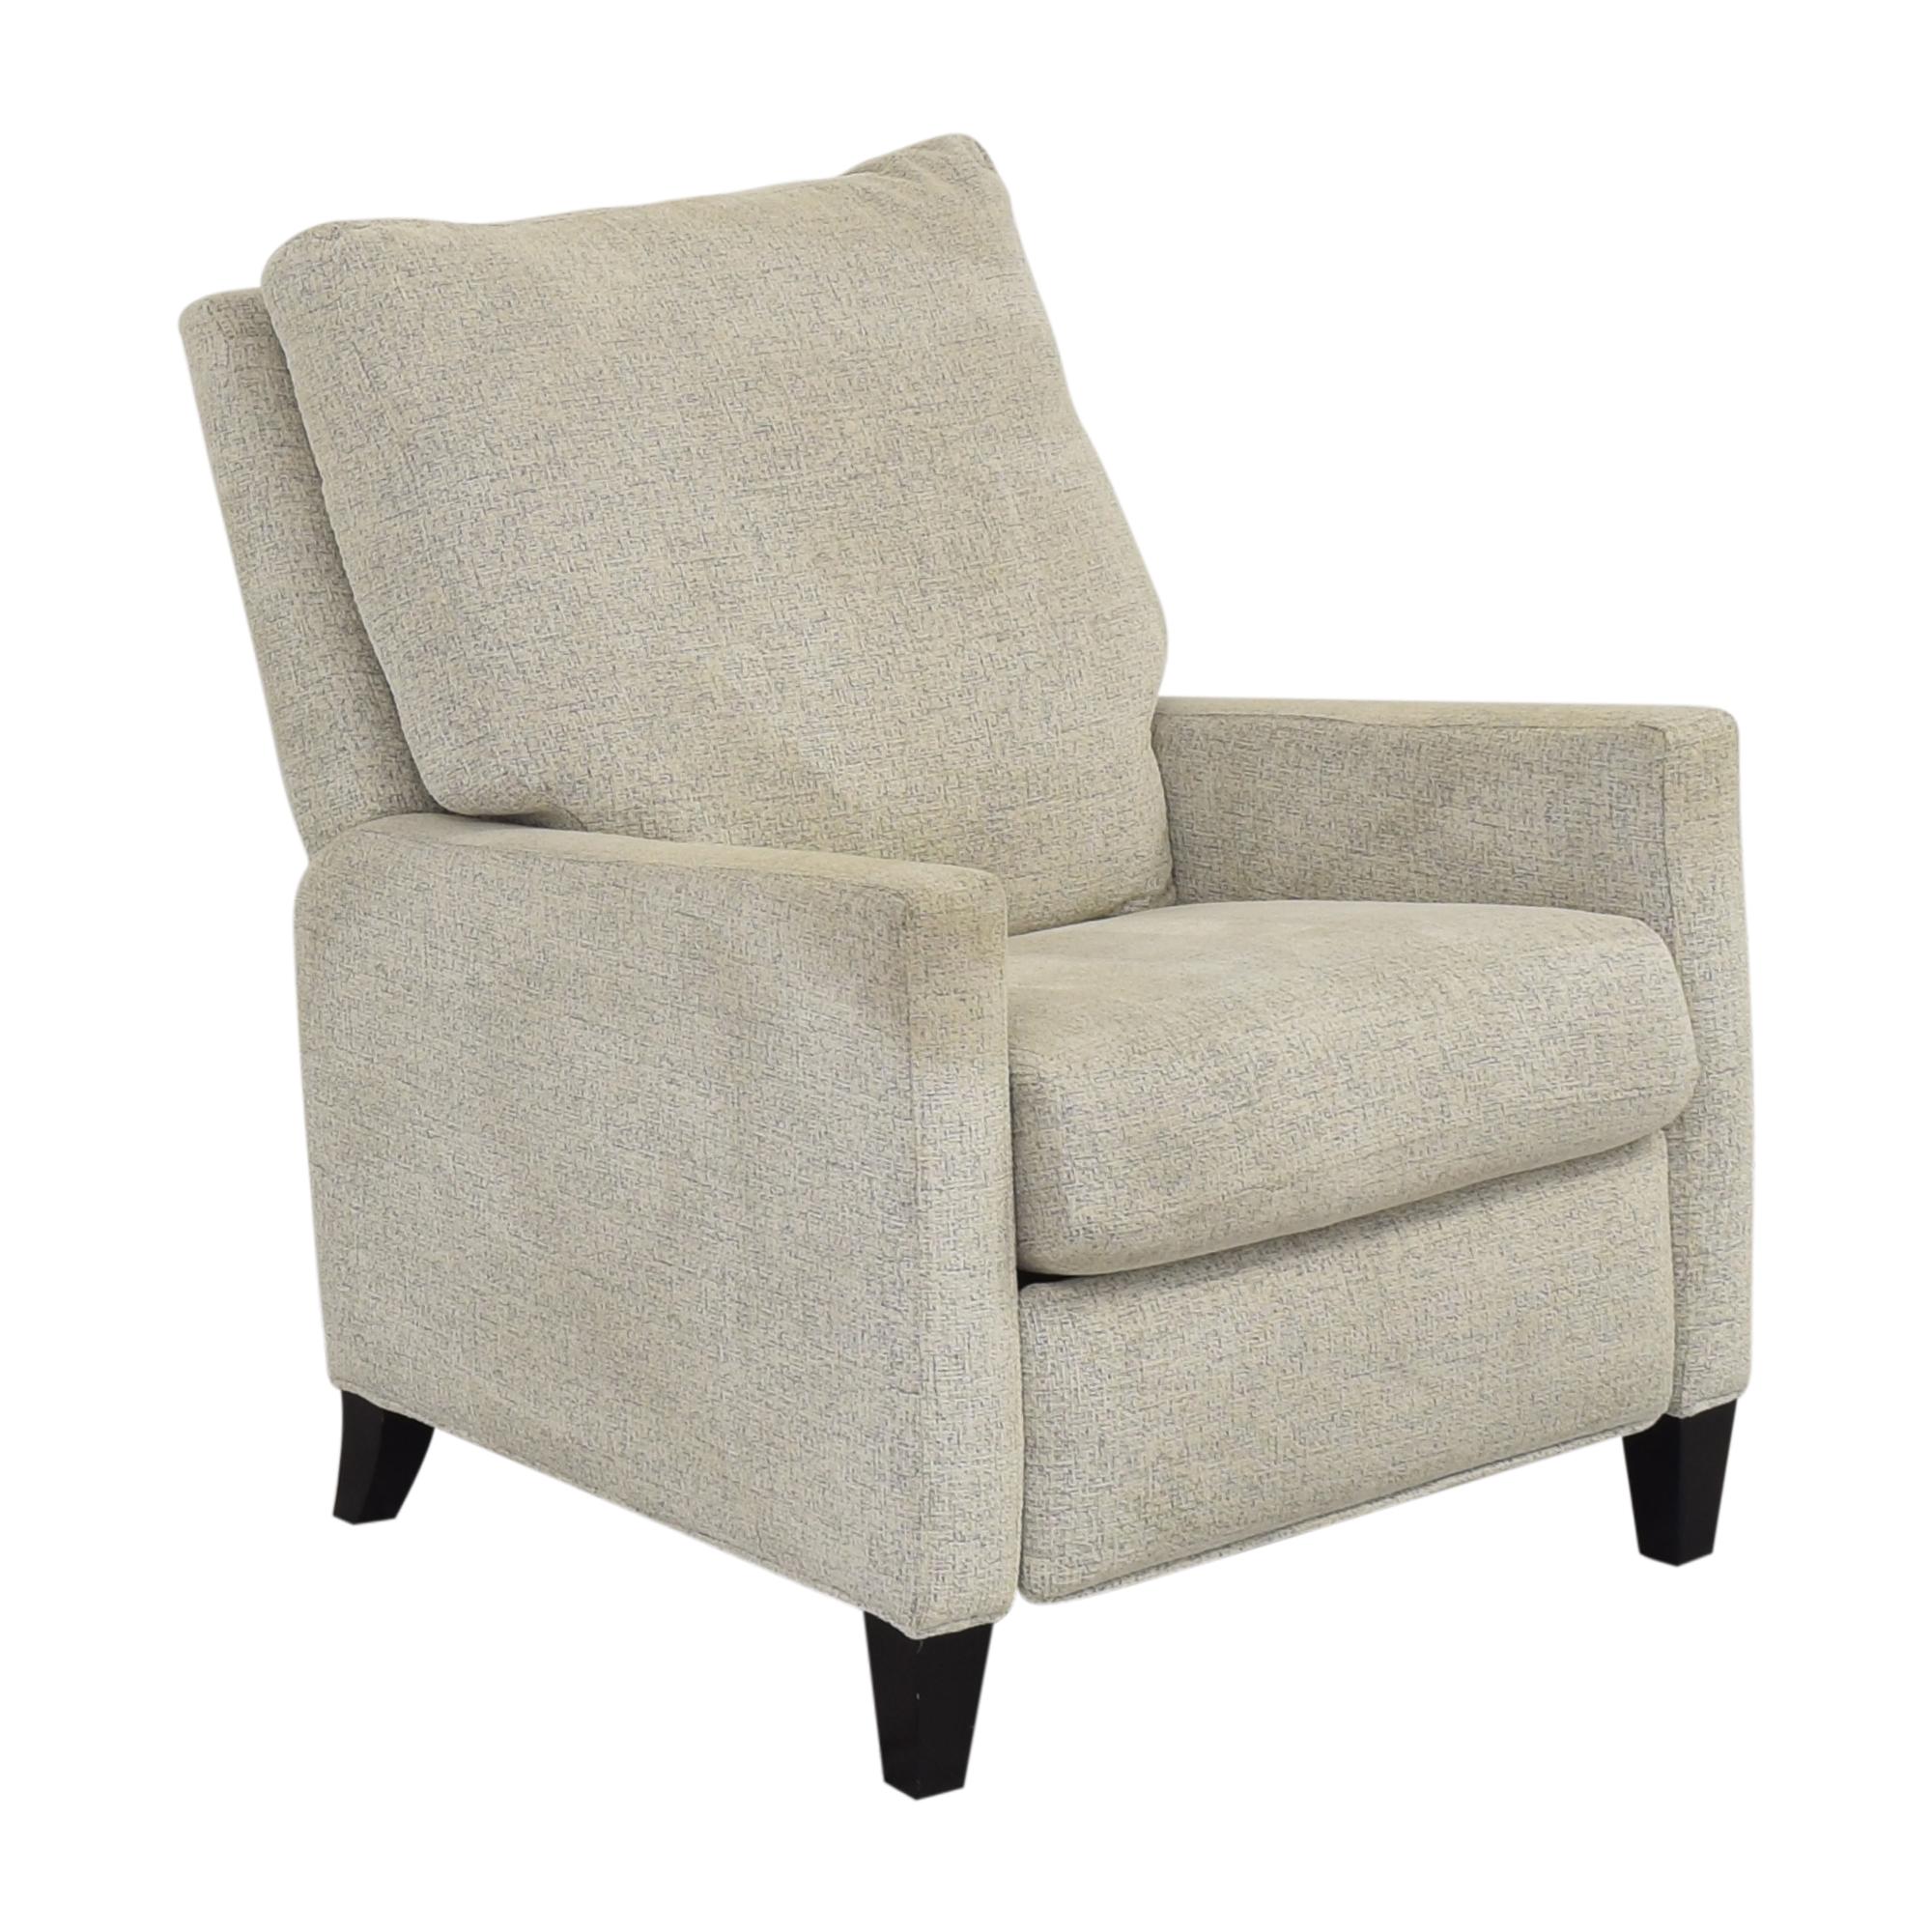 Bloomingdale's Sophie Power-Recliner Chair / Chairs